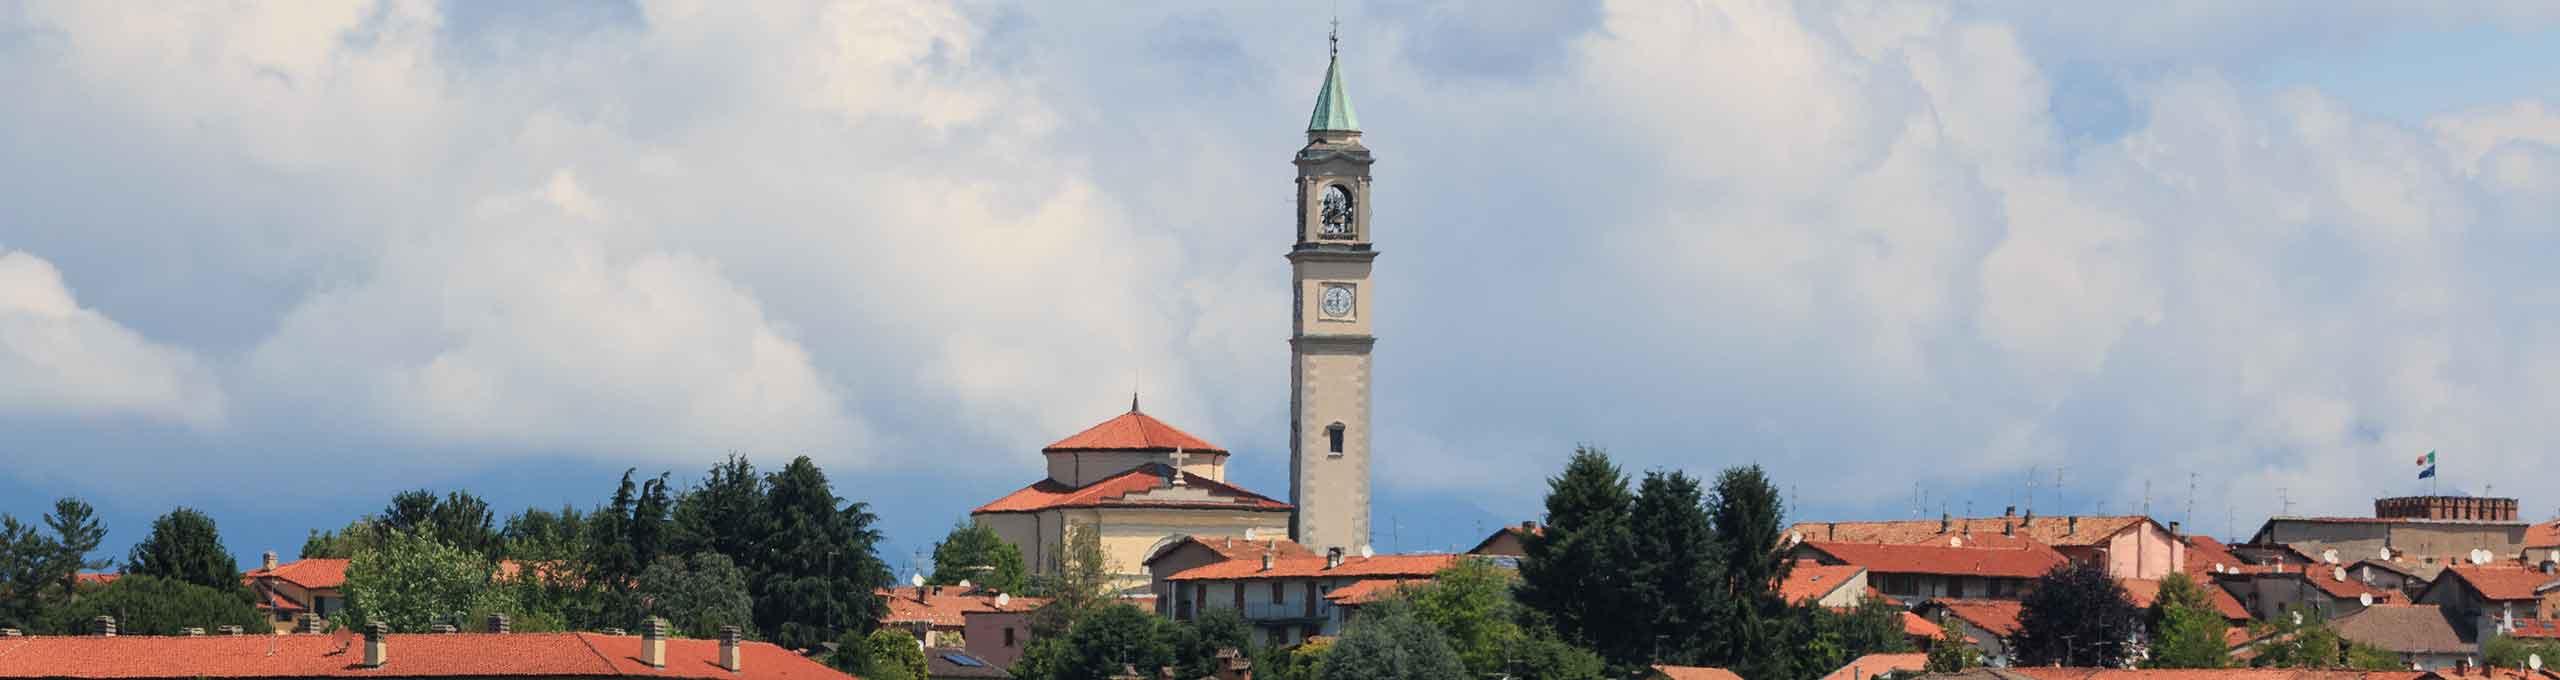 Guanzate, Lago di Como